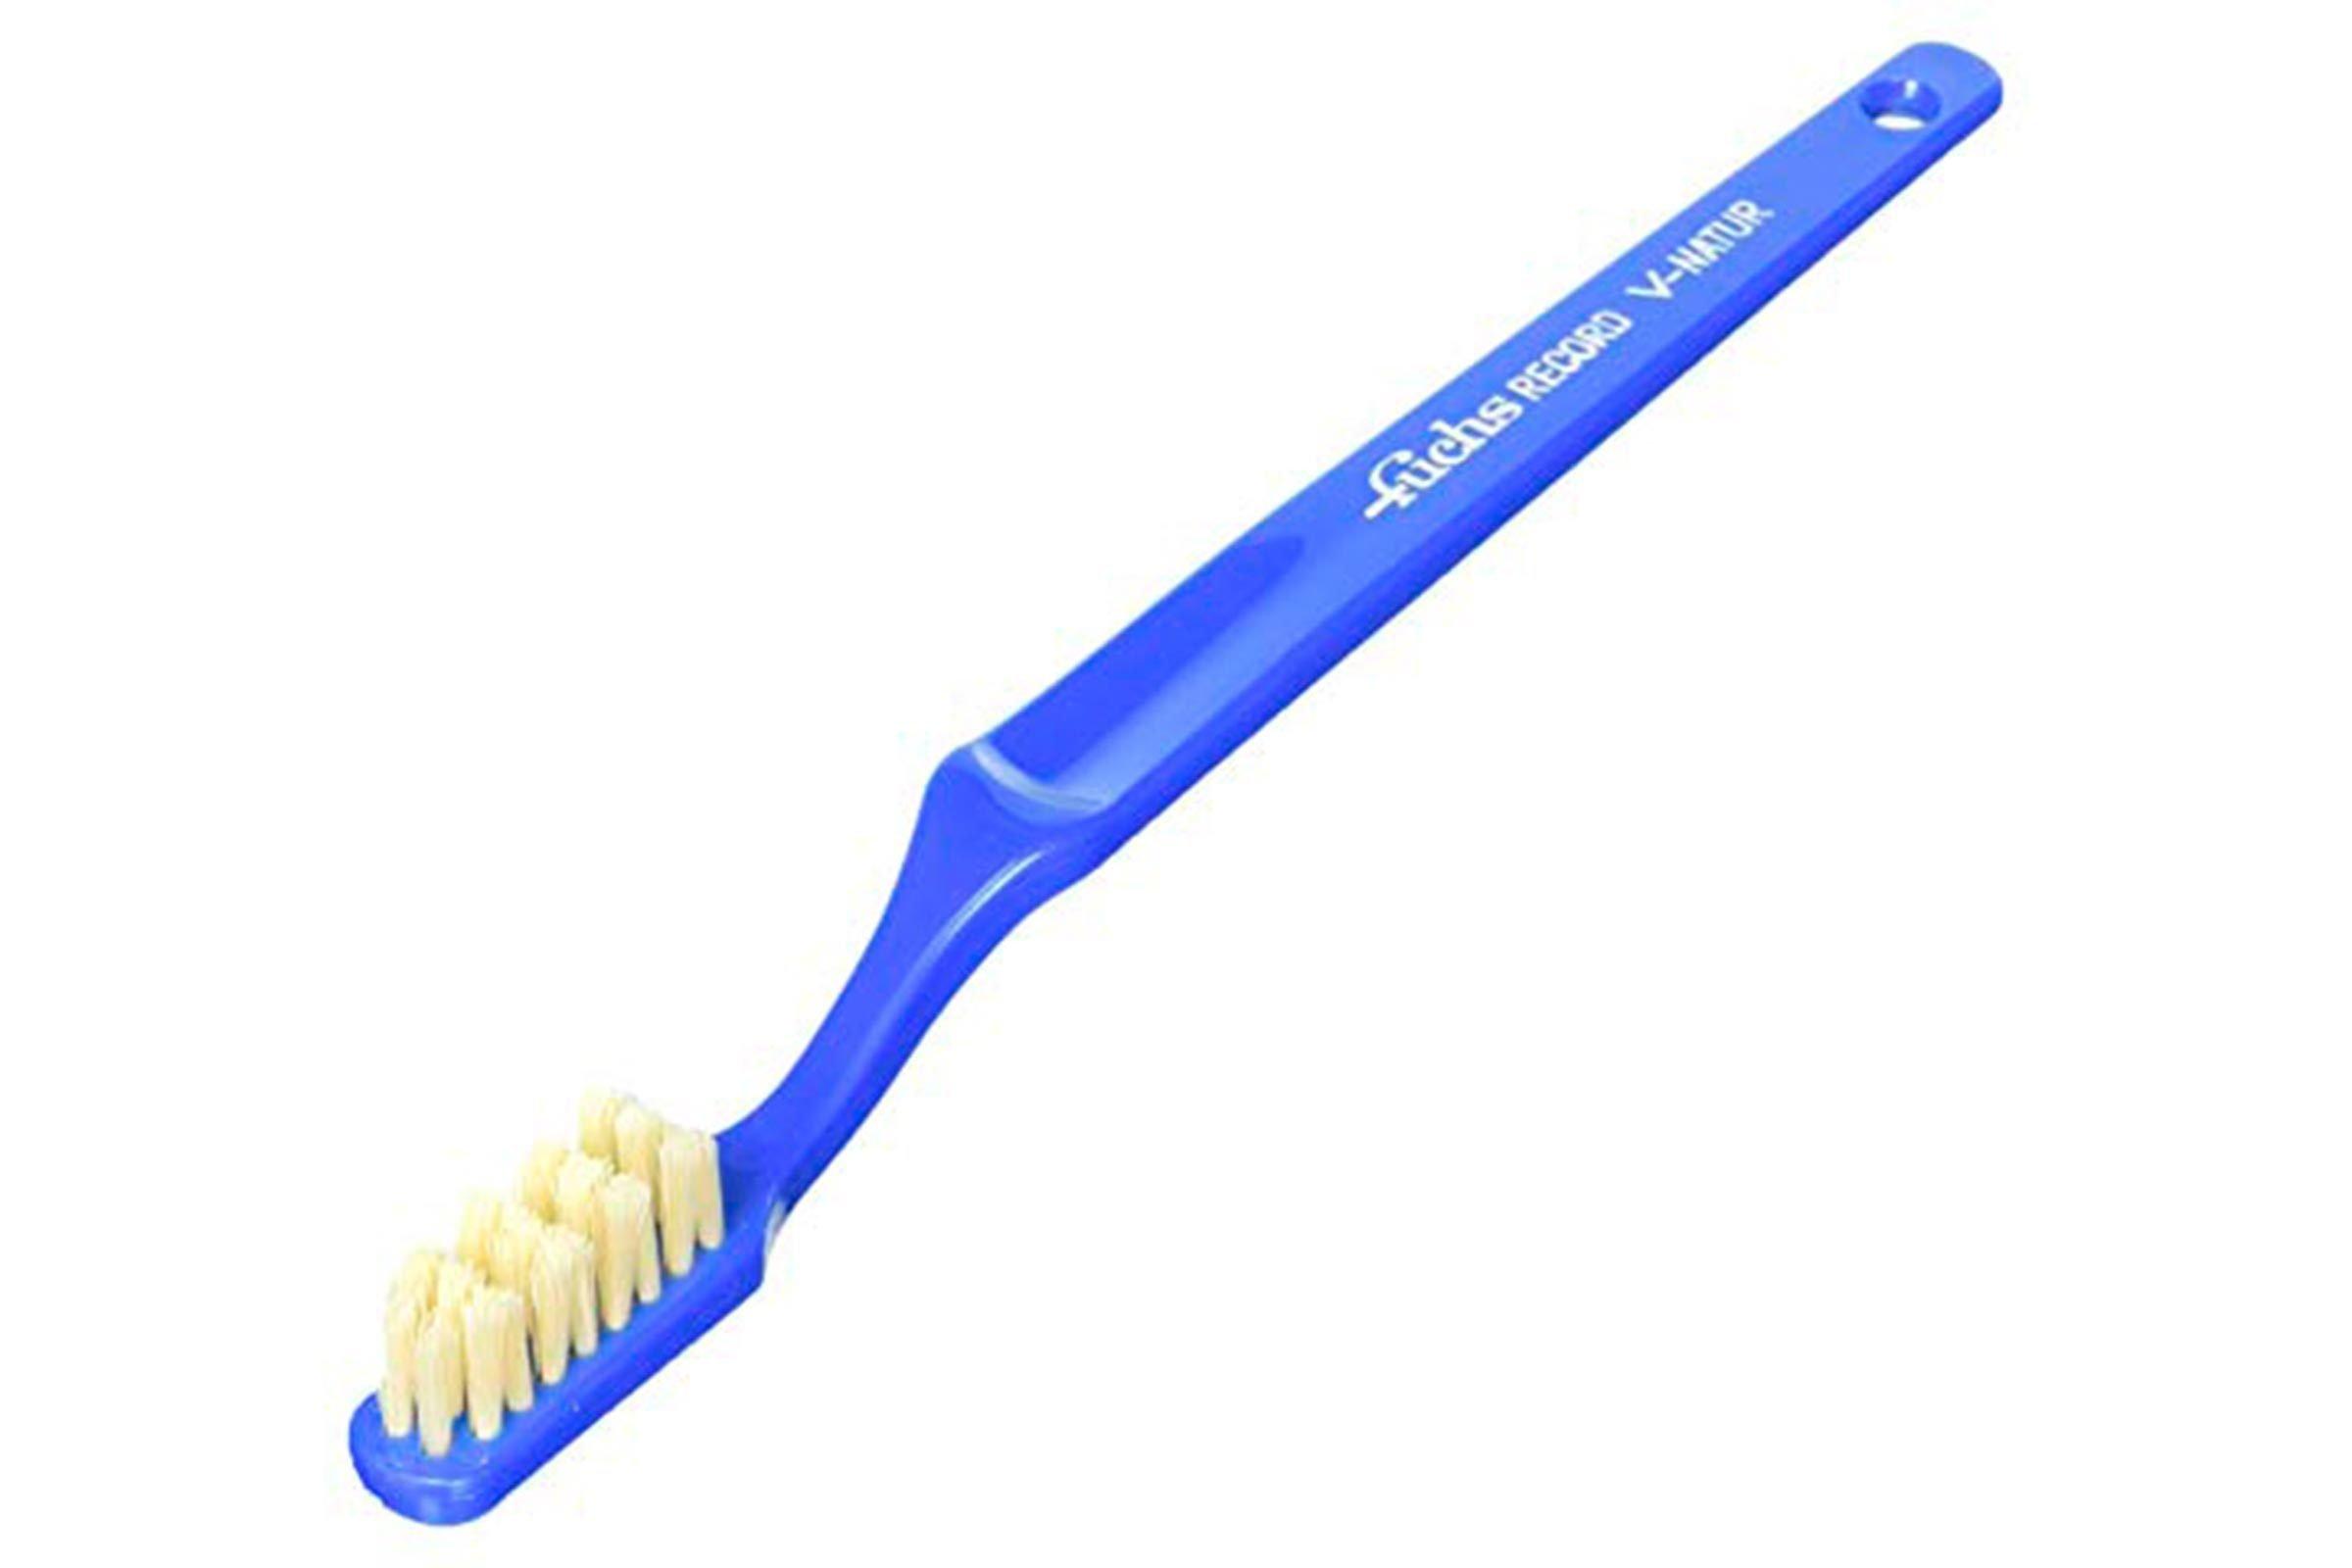 Boar bristle toothbrush